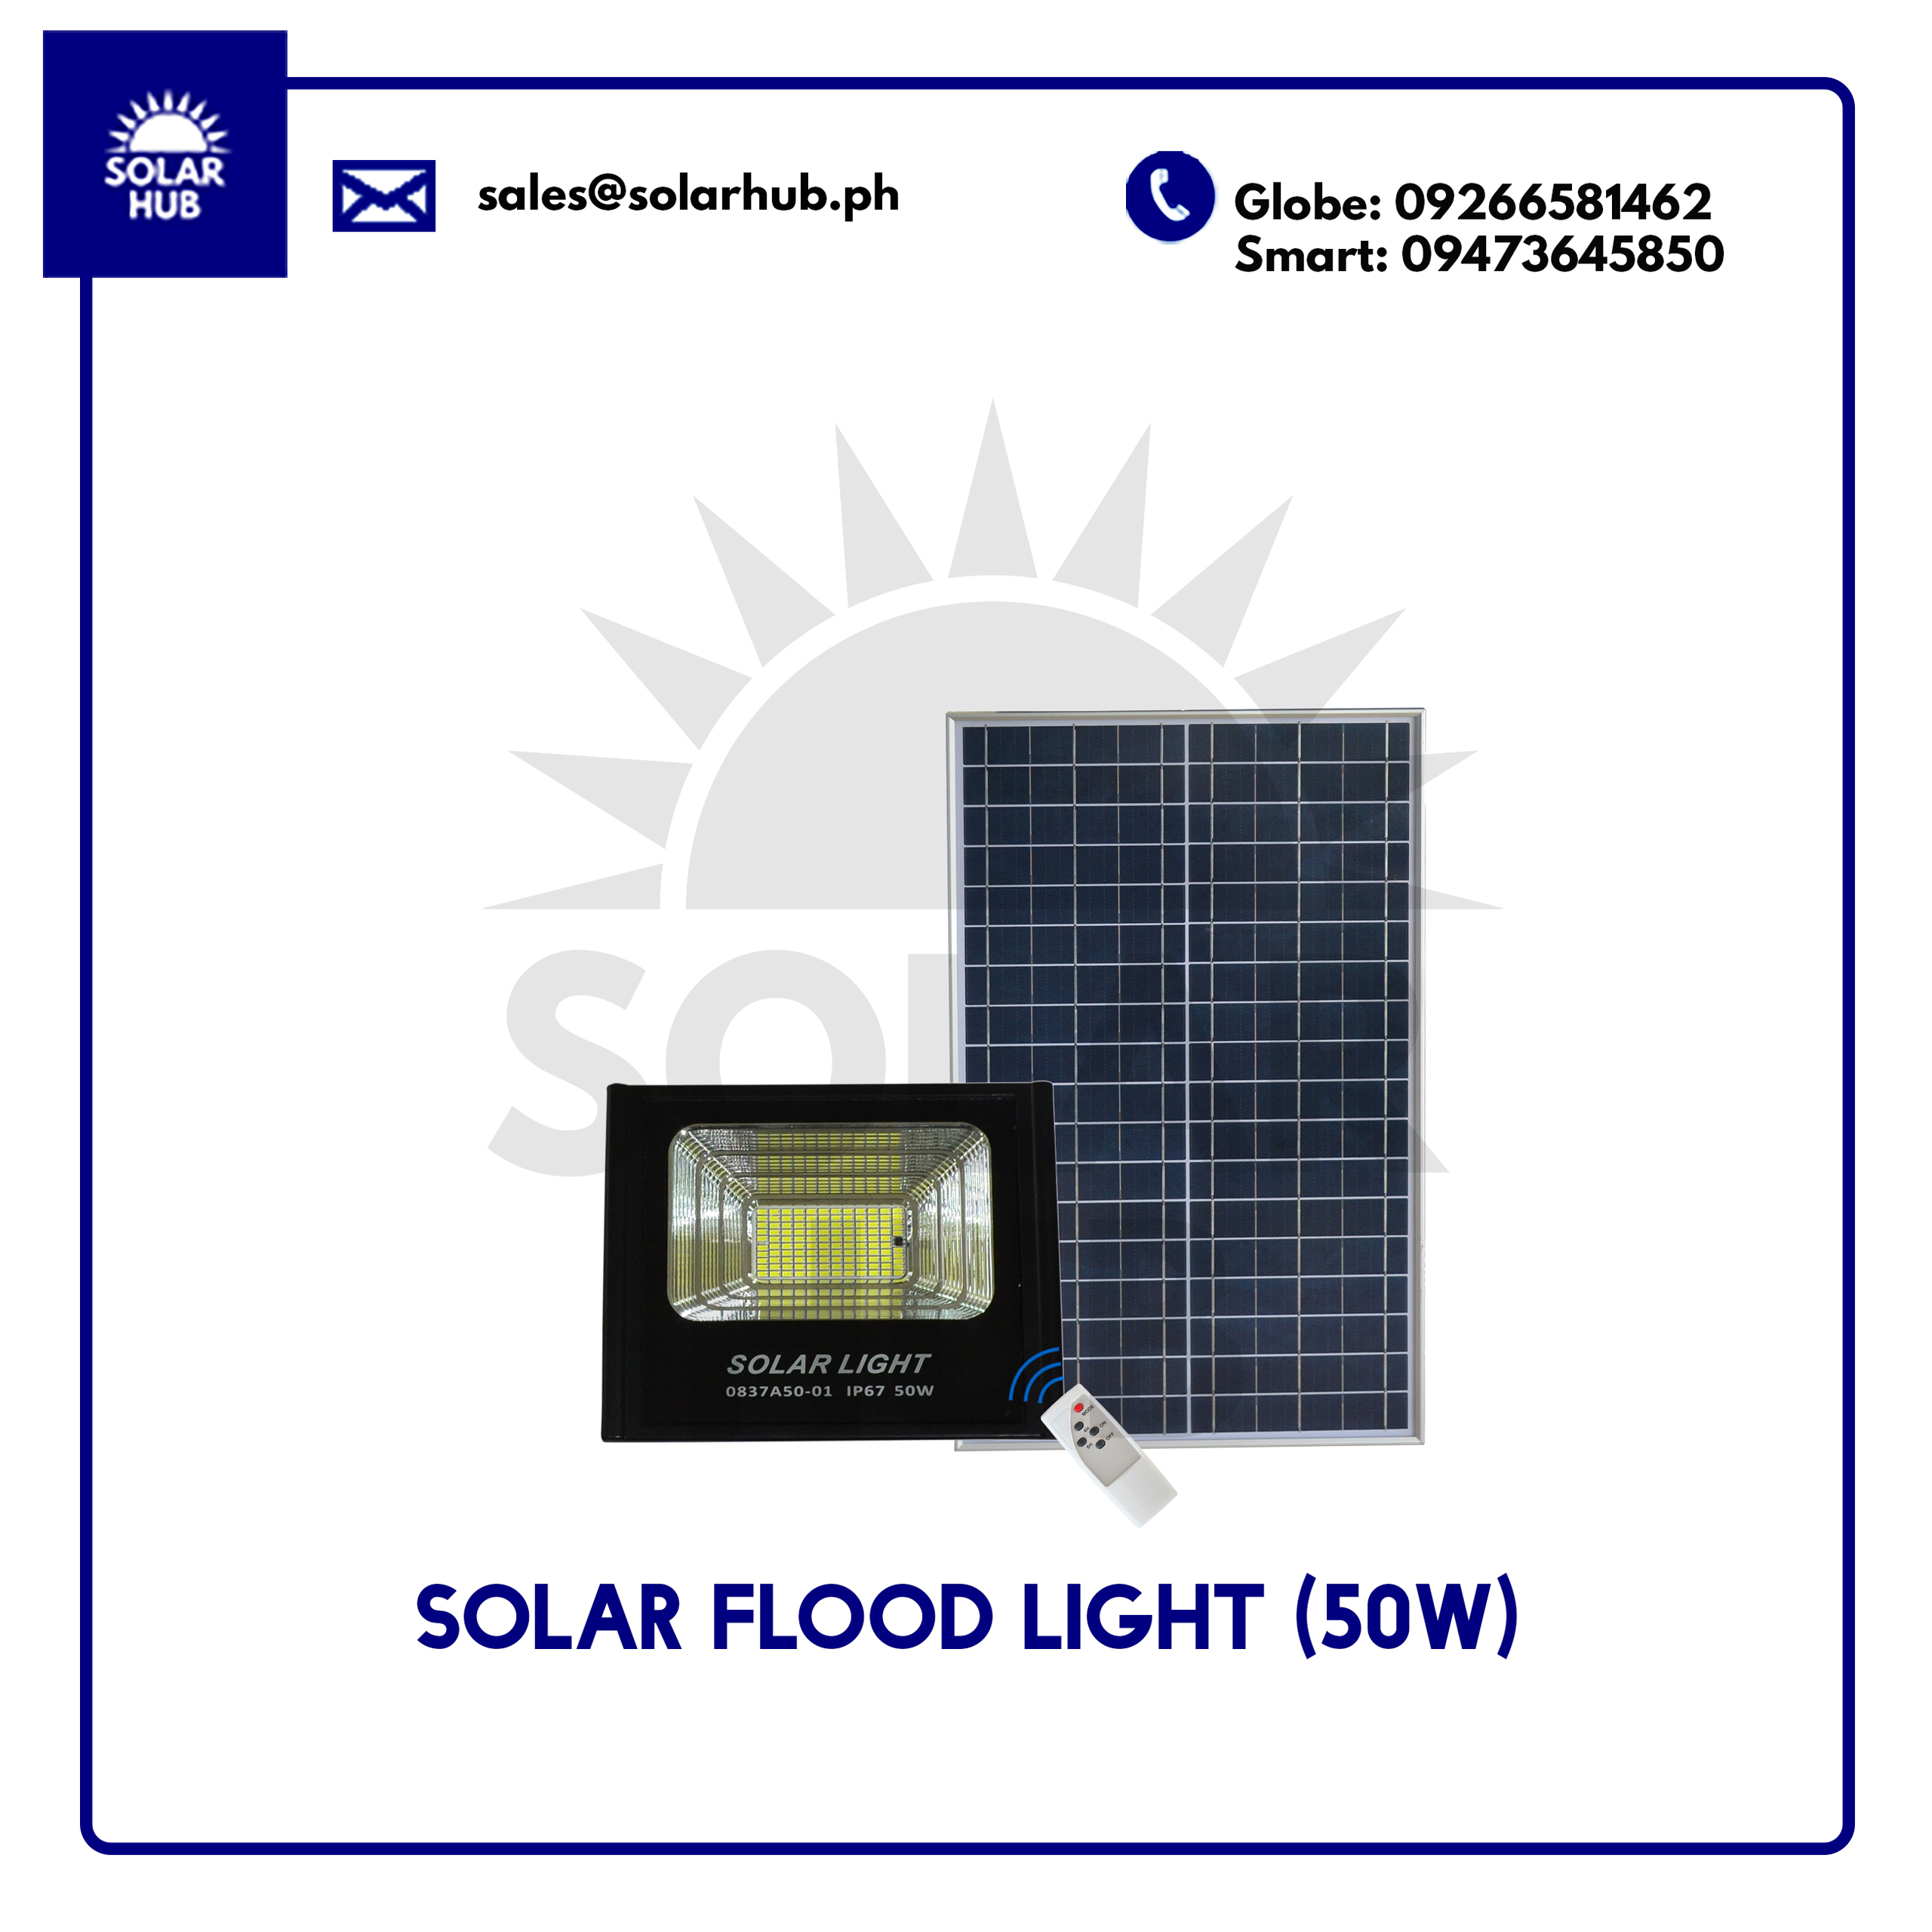 Solar Flood Light 50W